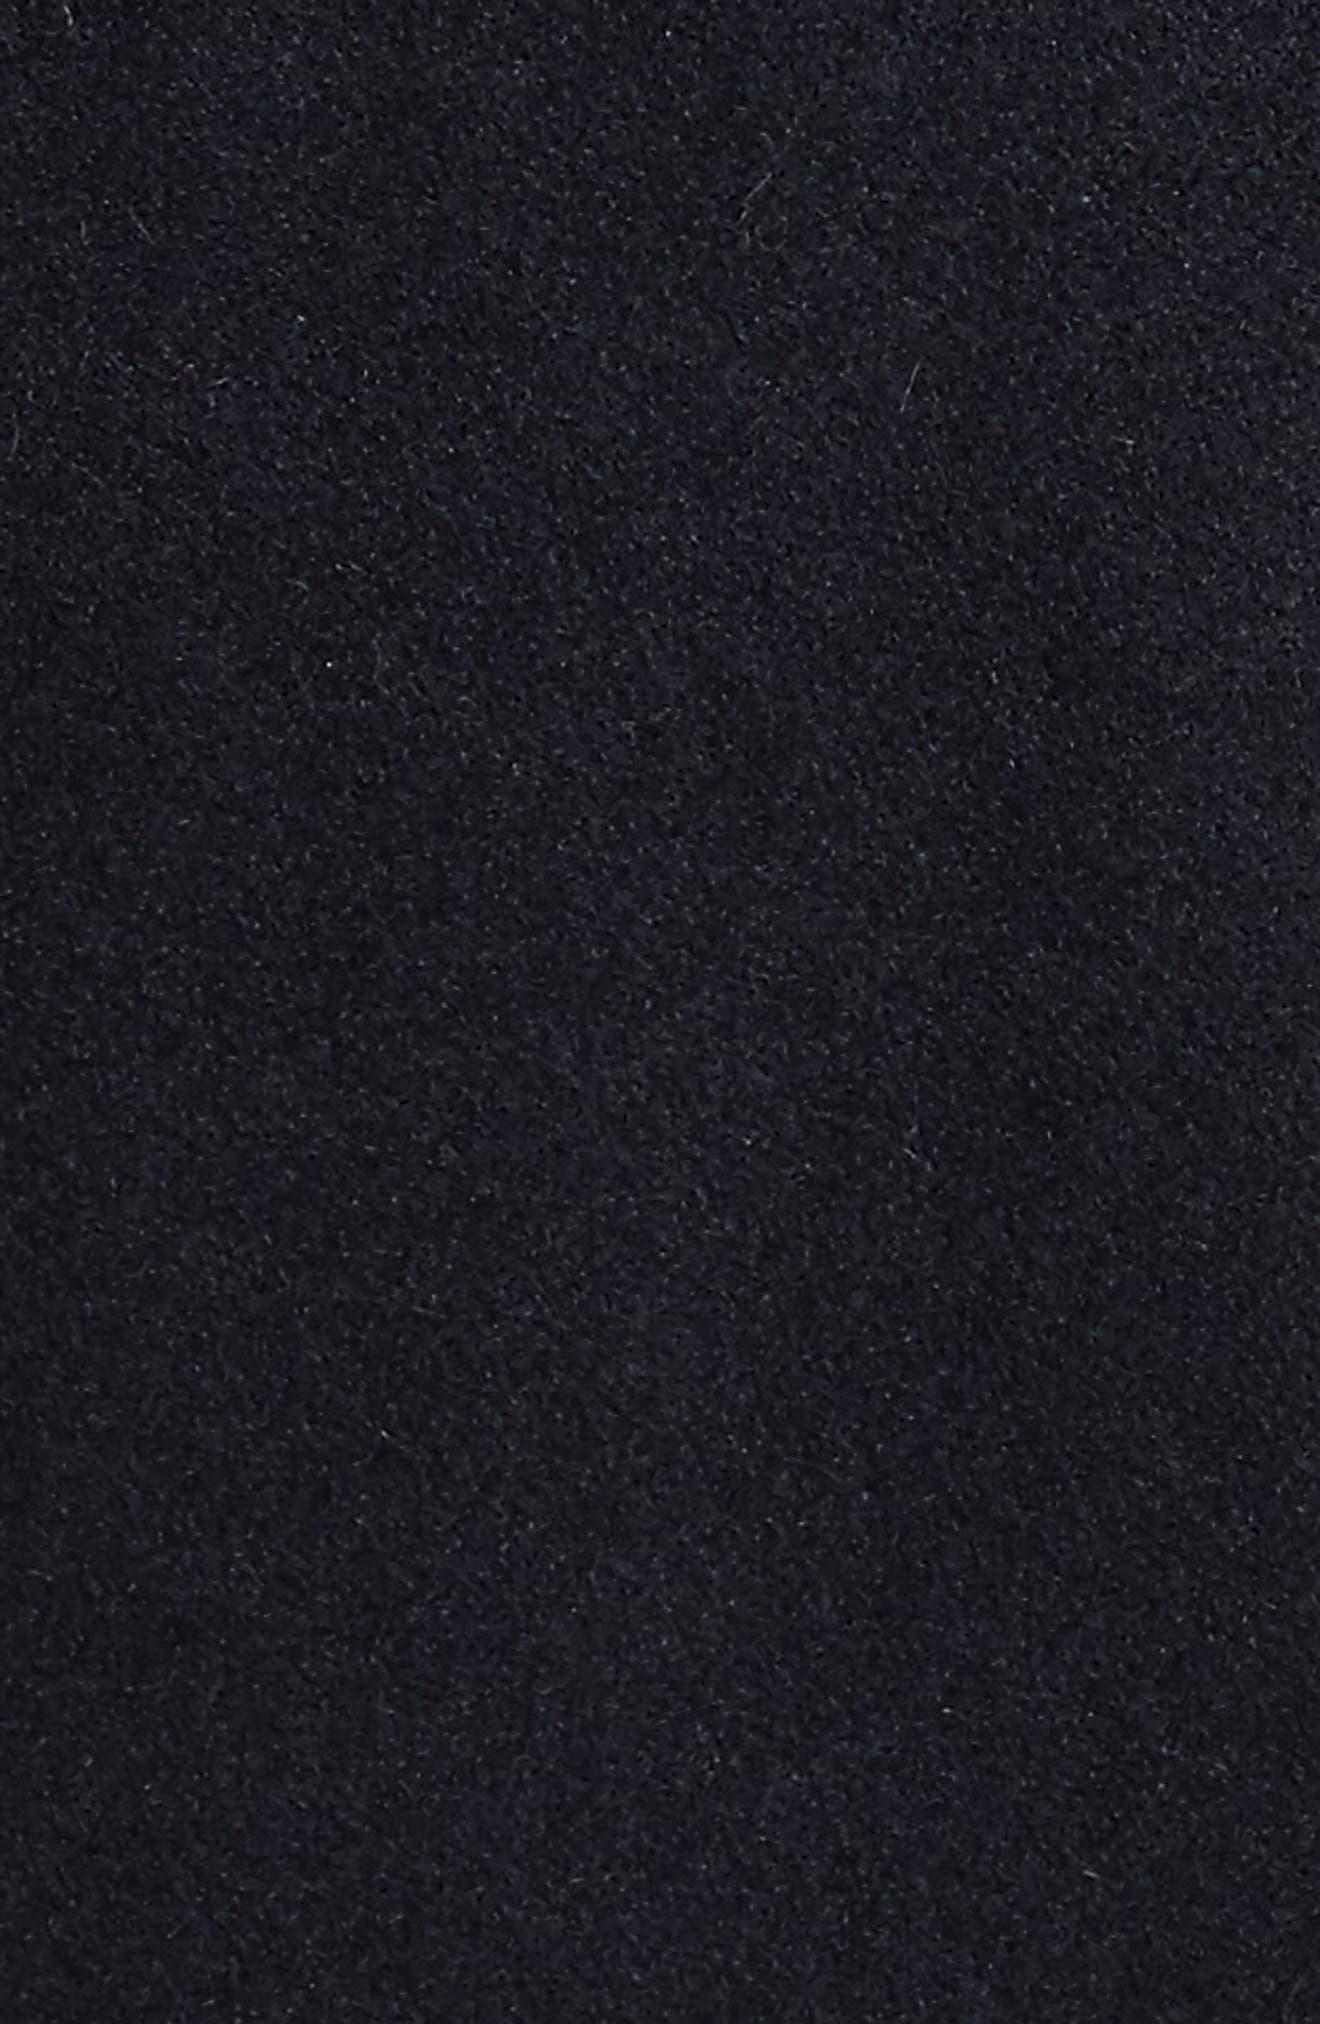 Cole Haan Melton Wool Blend Anorak,                             Alternate thumbnail 6, color,                             410